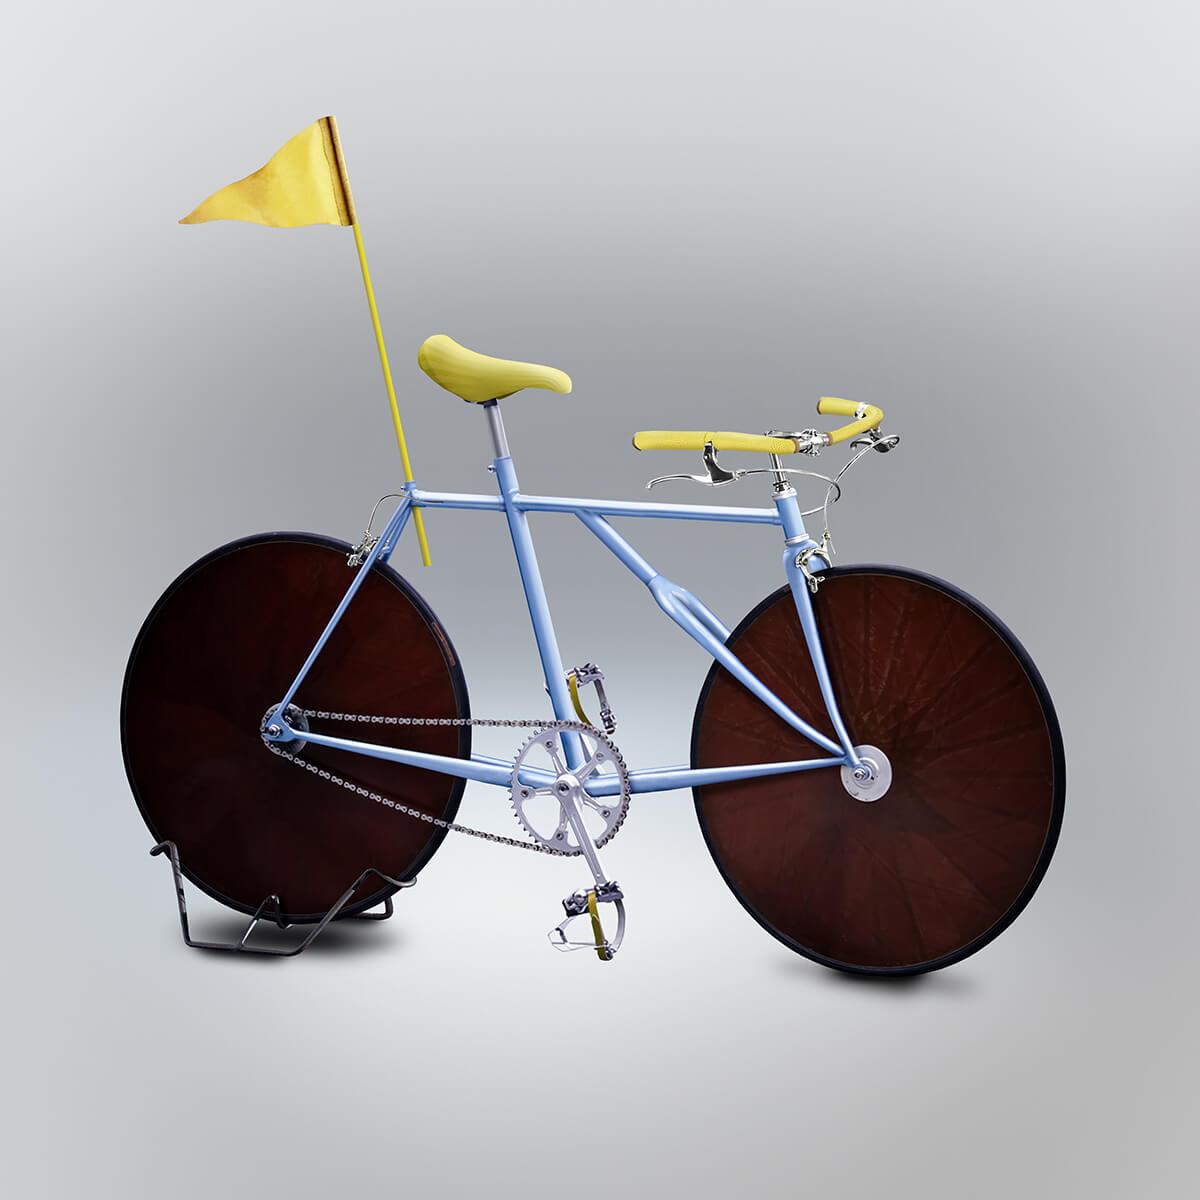 gianluca-gimini-bikes-12